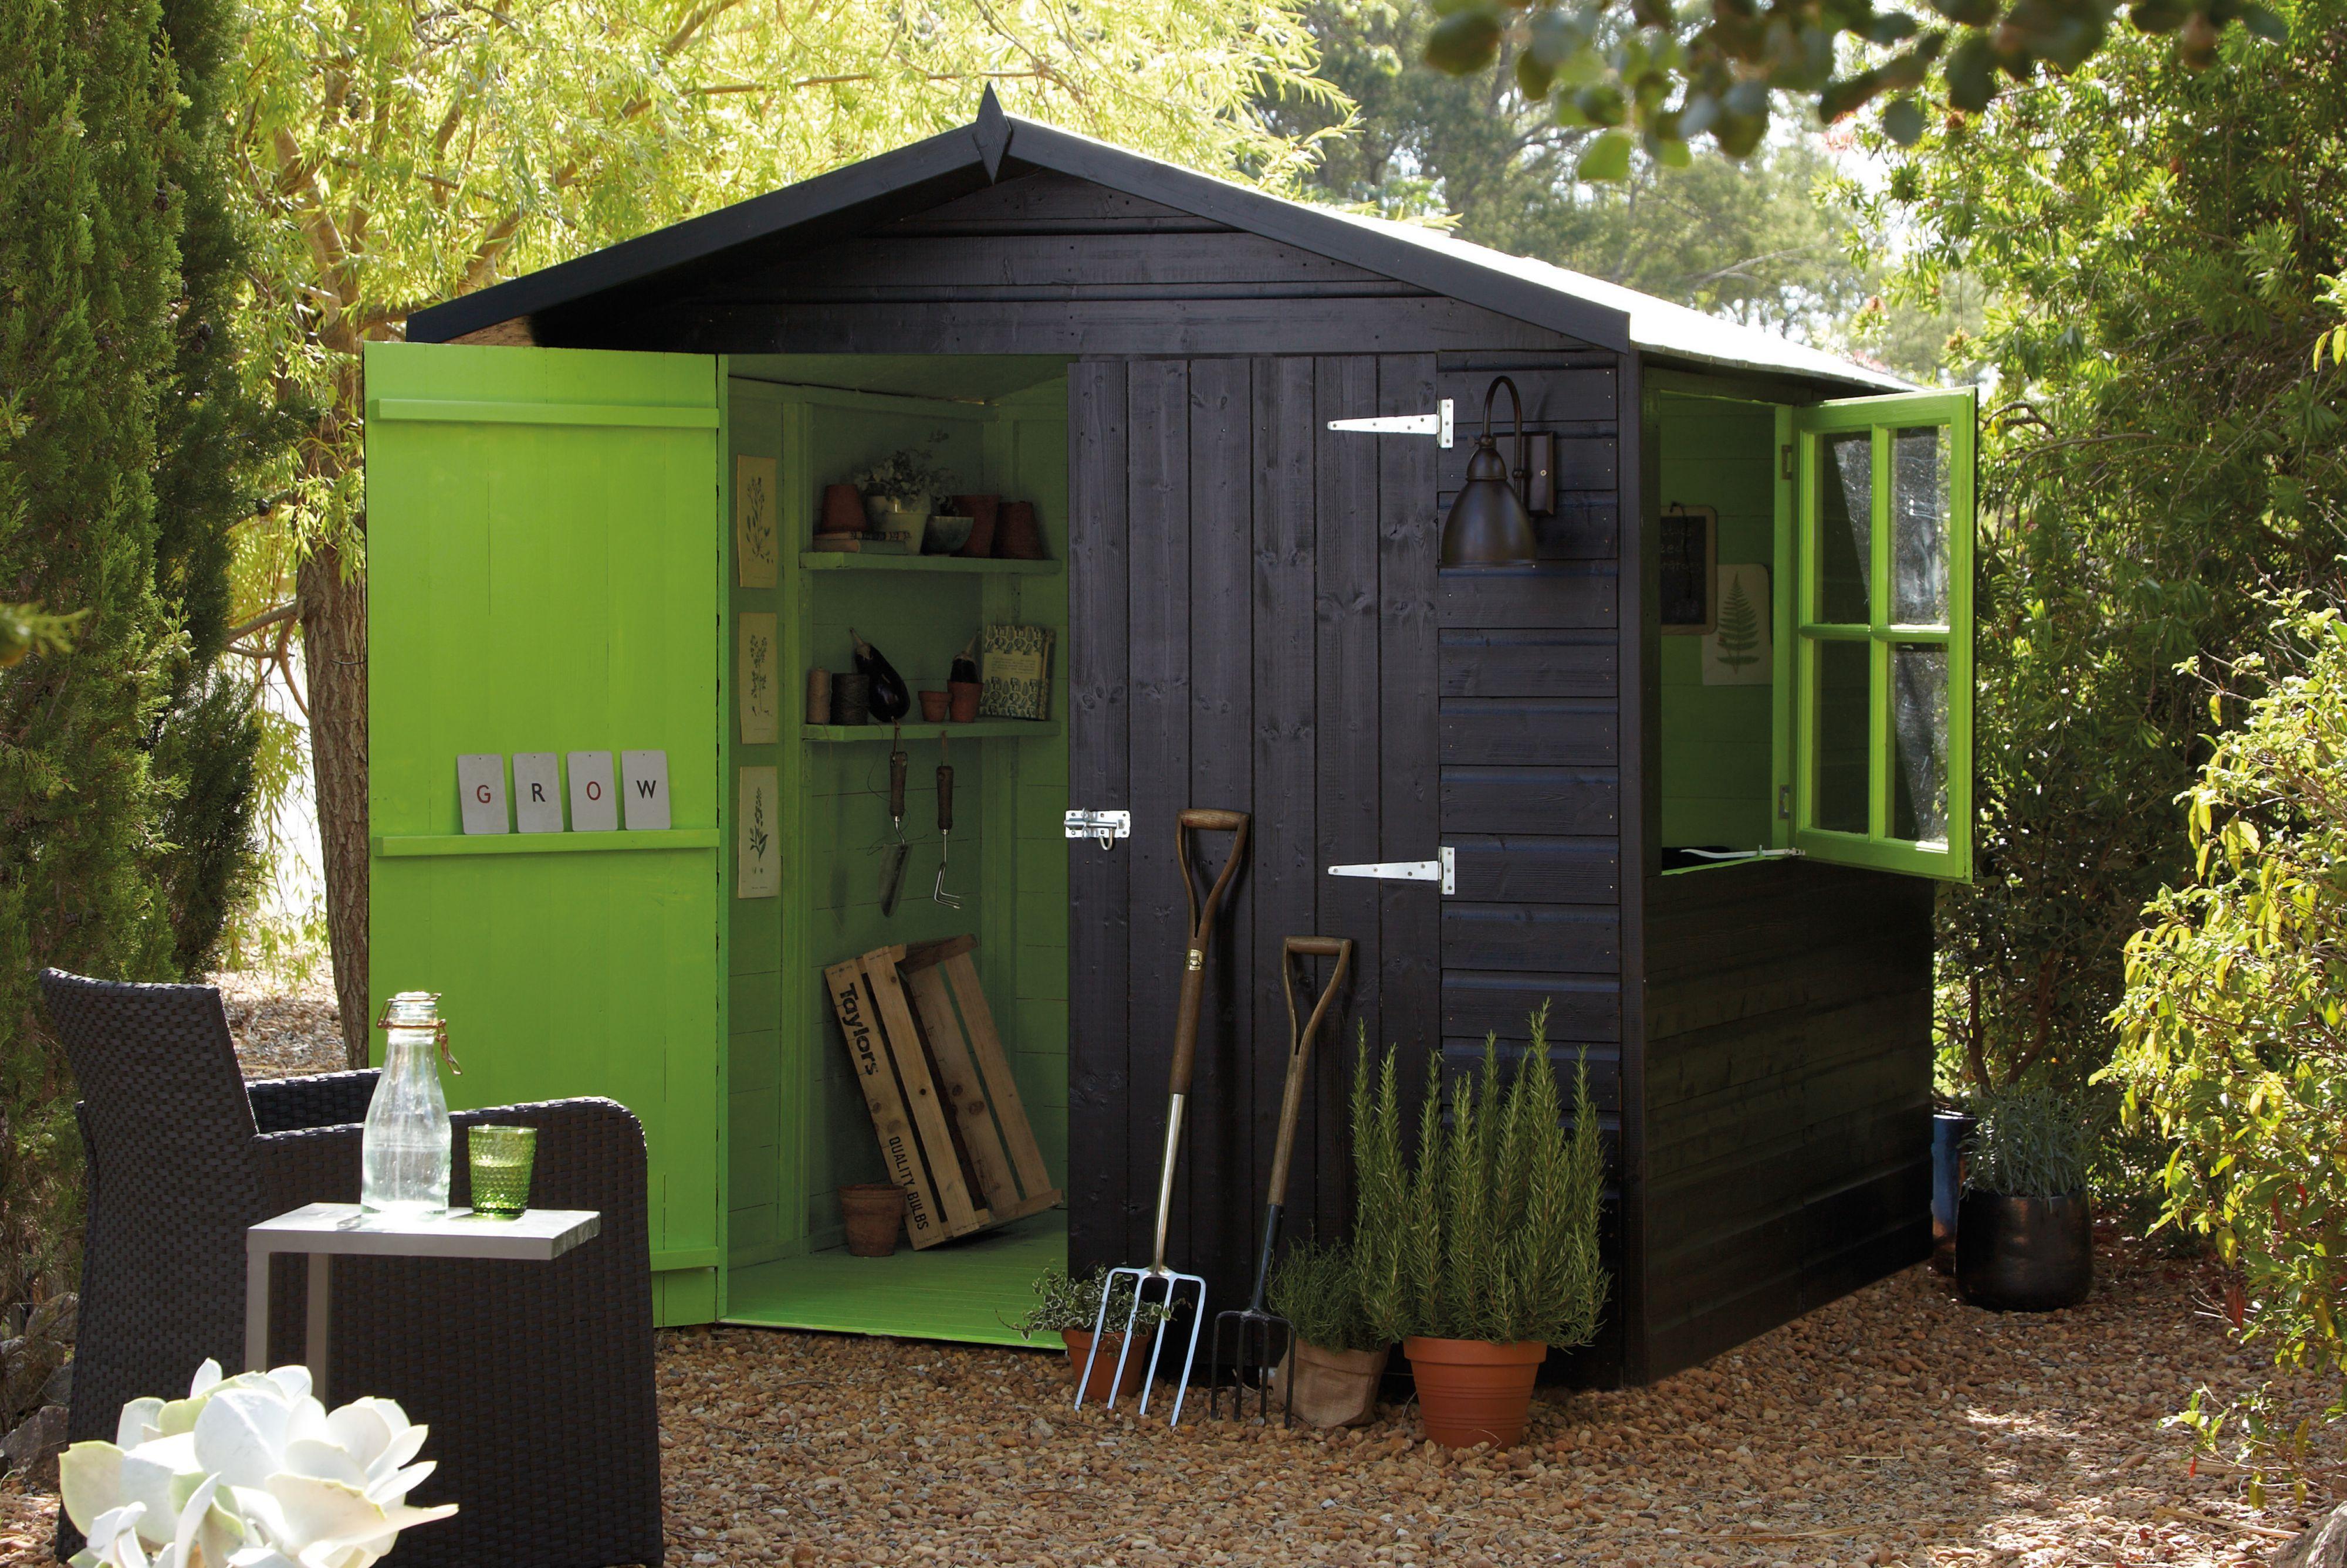 Homebase %7C DIY Bathroom Kitchen Garden Furniture | Smart House ...